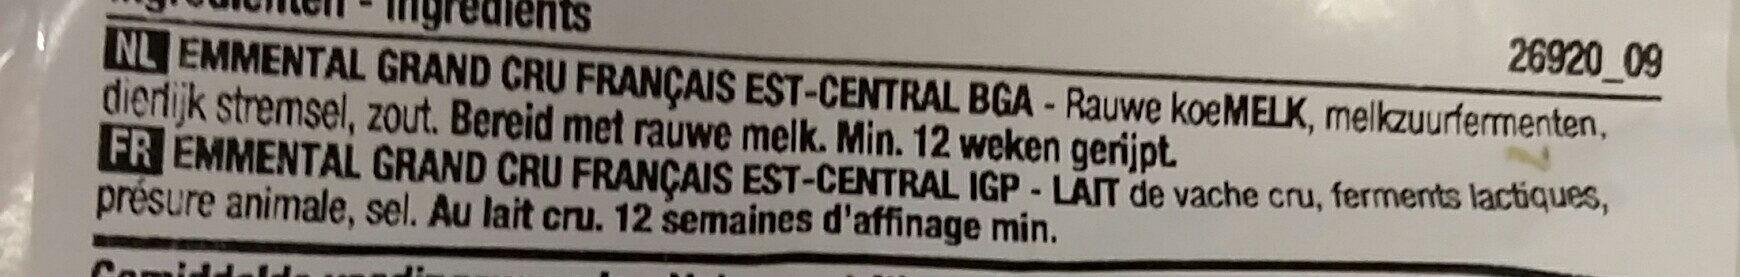 Emmental grand cru bloc - Ingredients - fr